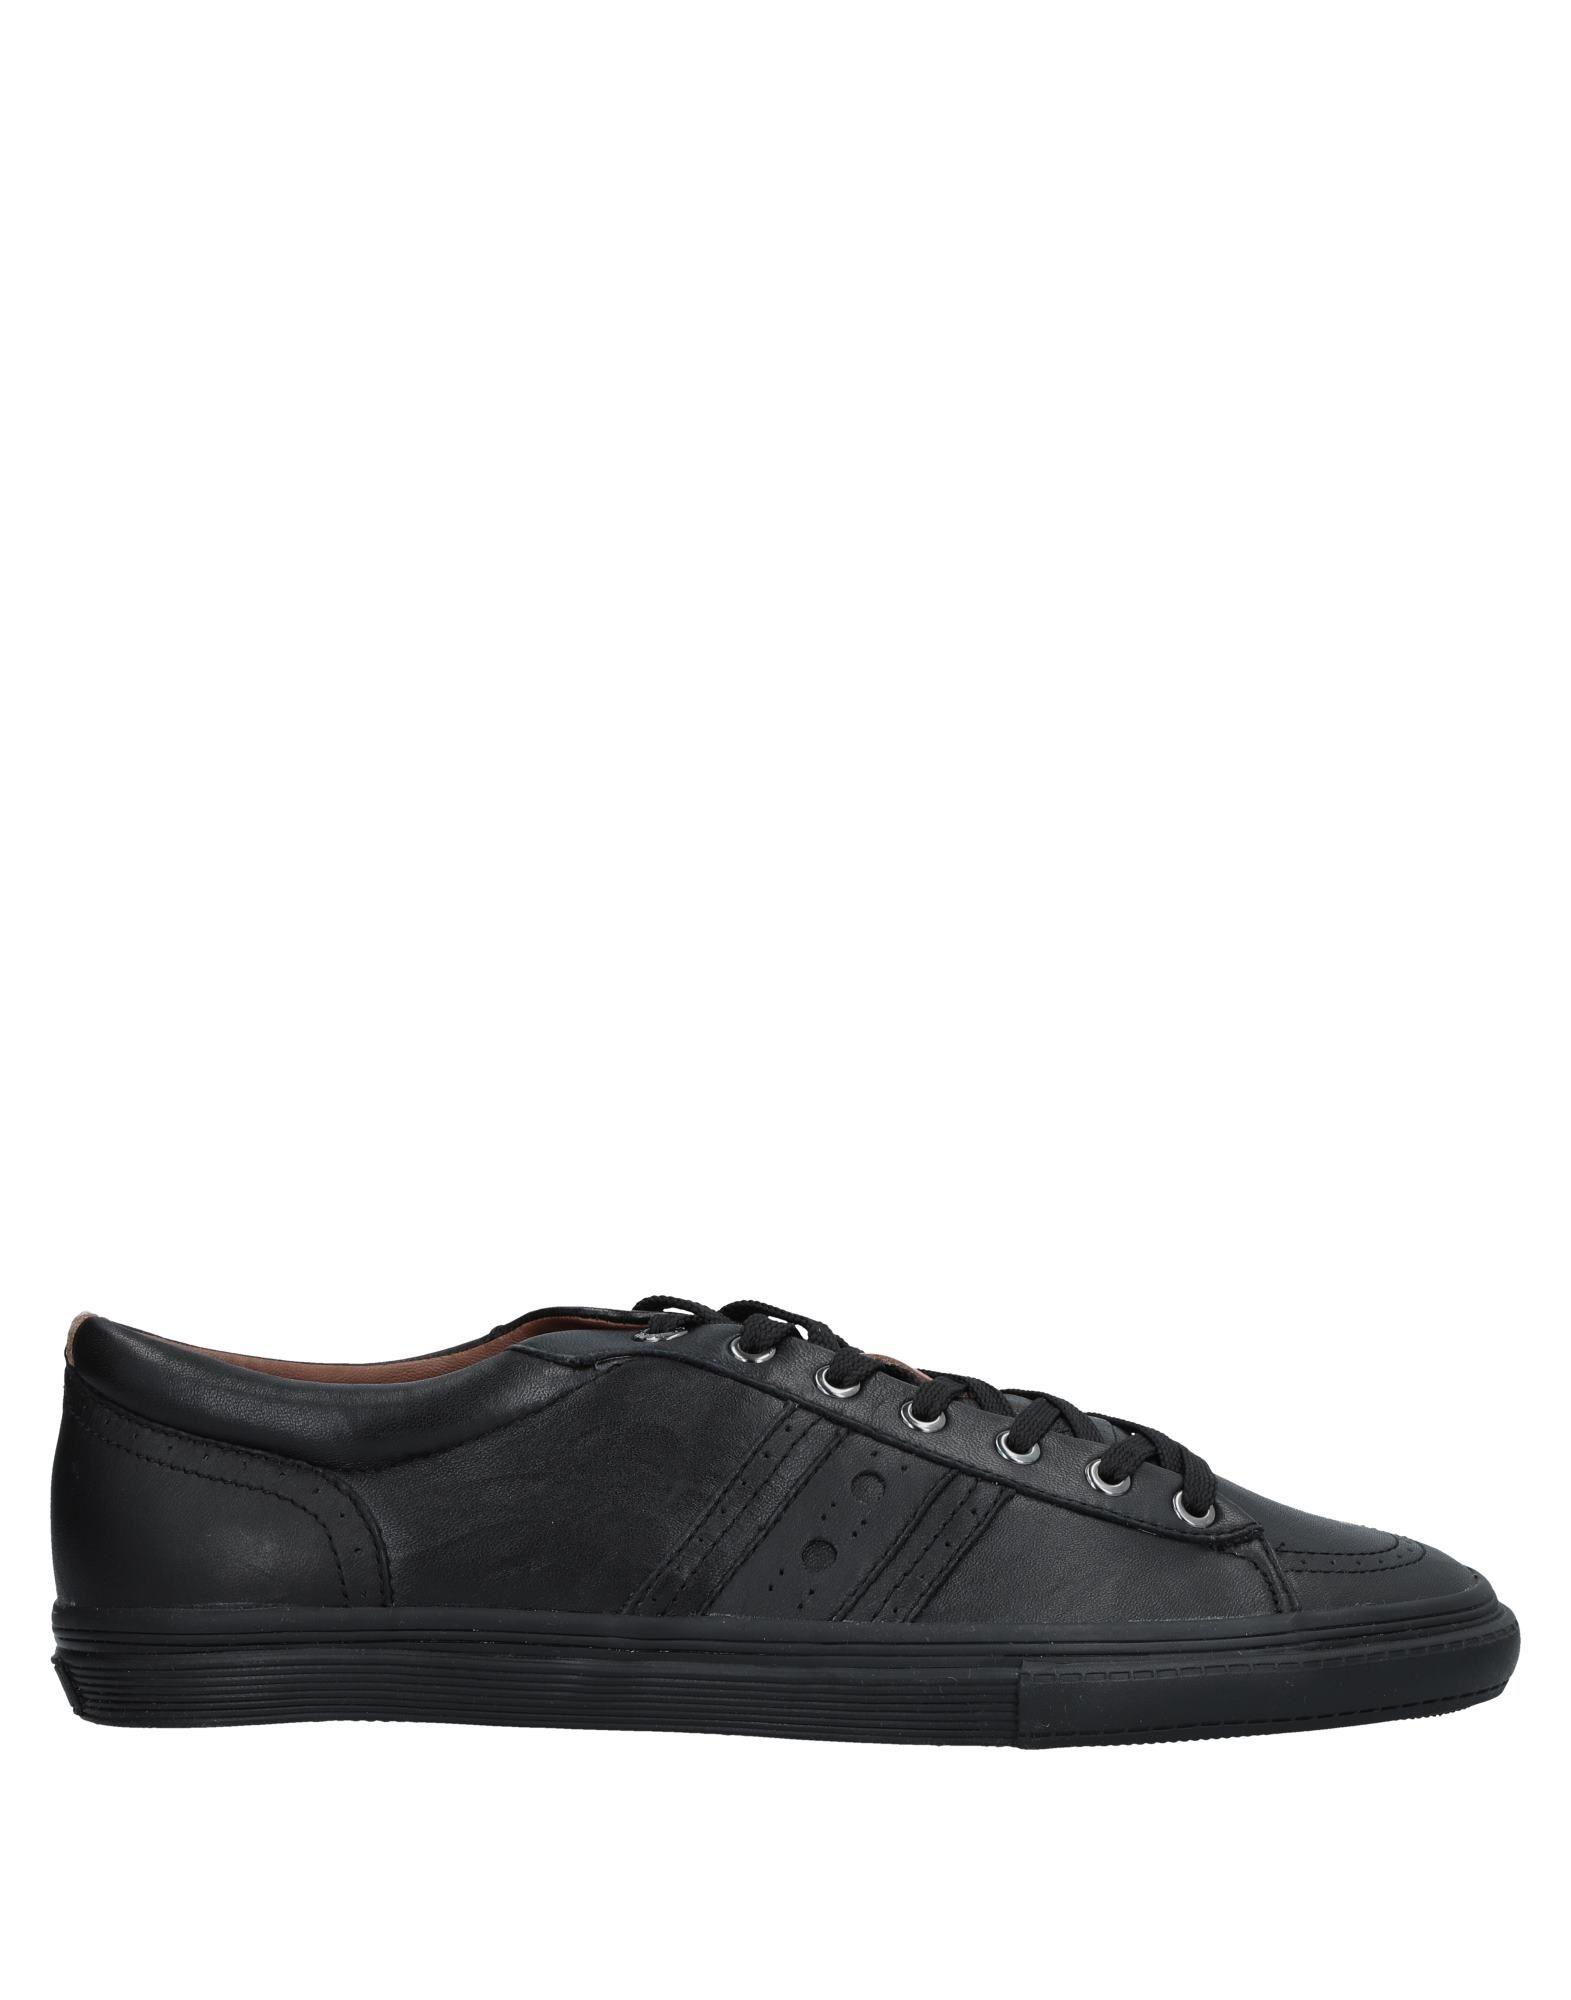 Paul Smith Sneakers Herren  11536966TB Neue Schuhe